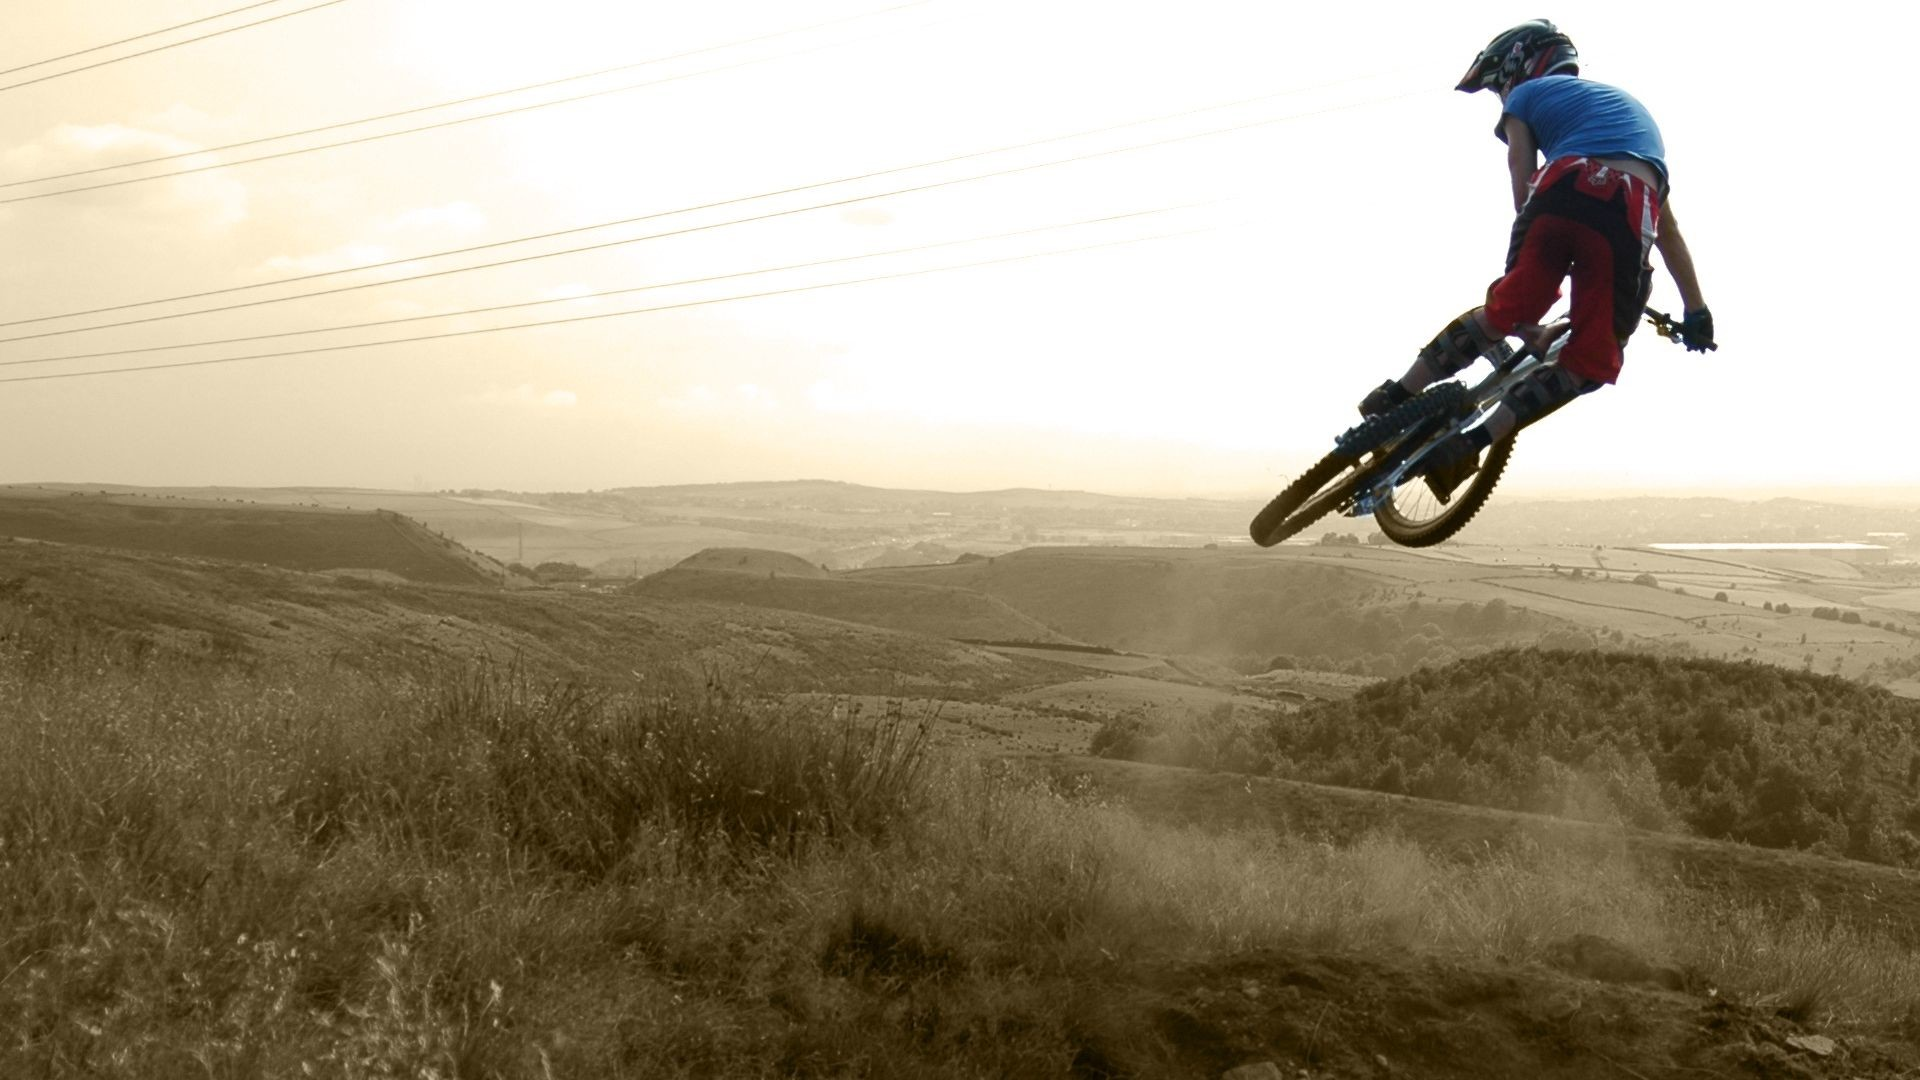 Red Bull Wallpaper Hd Iphone Downhill Mountain Bike Wallpaper 67 Images